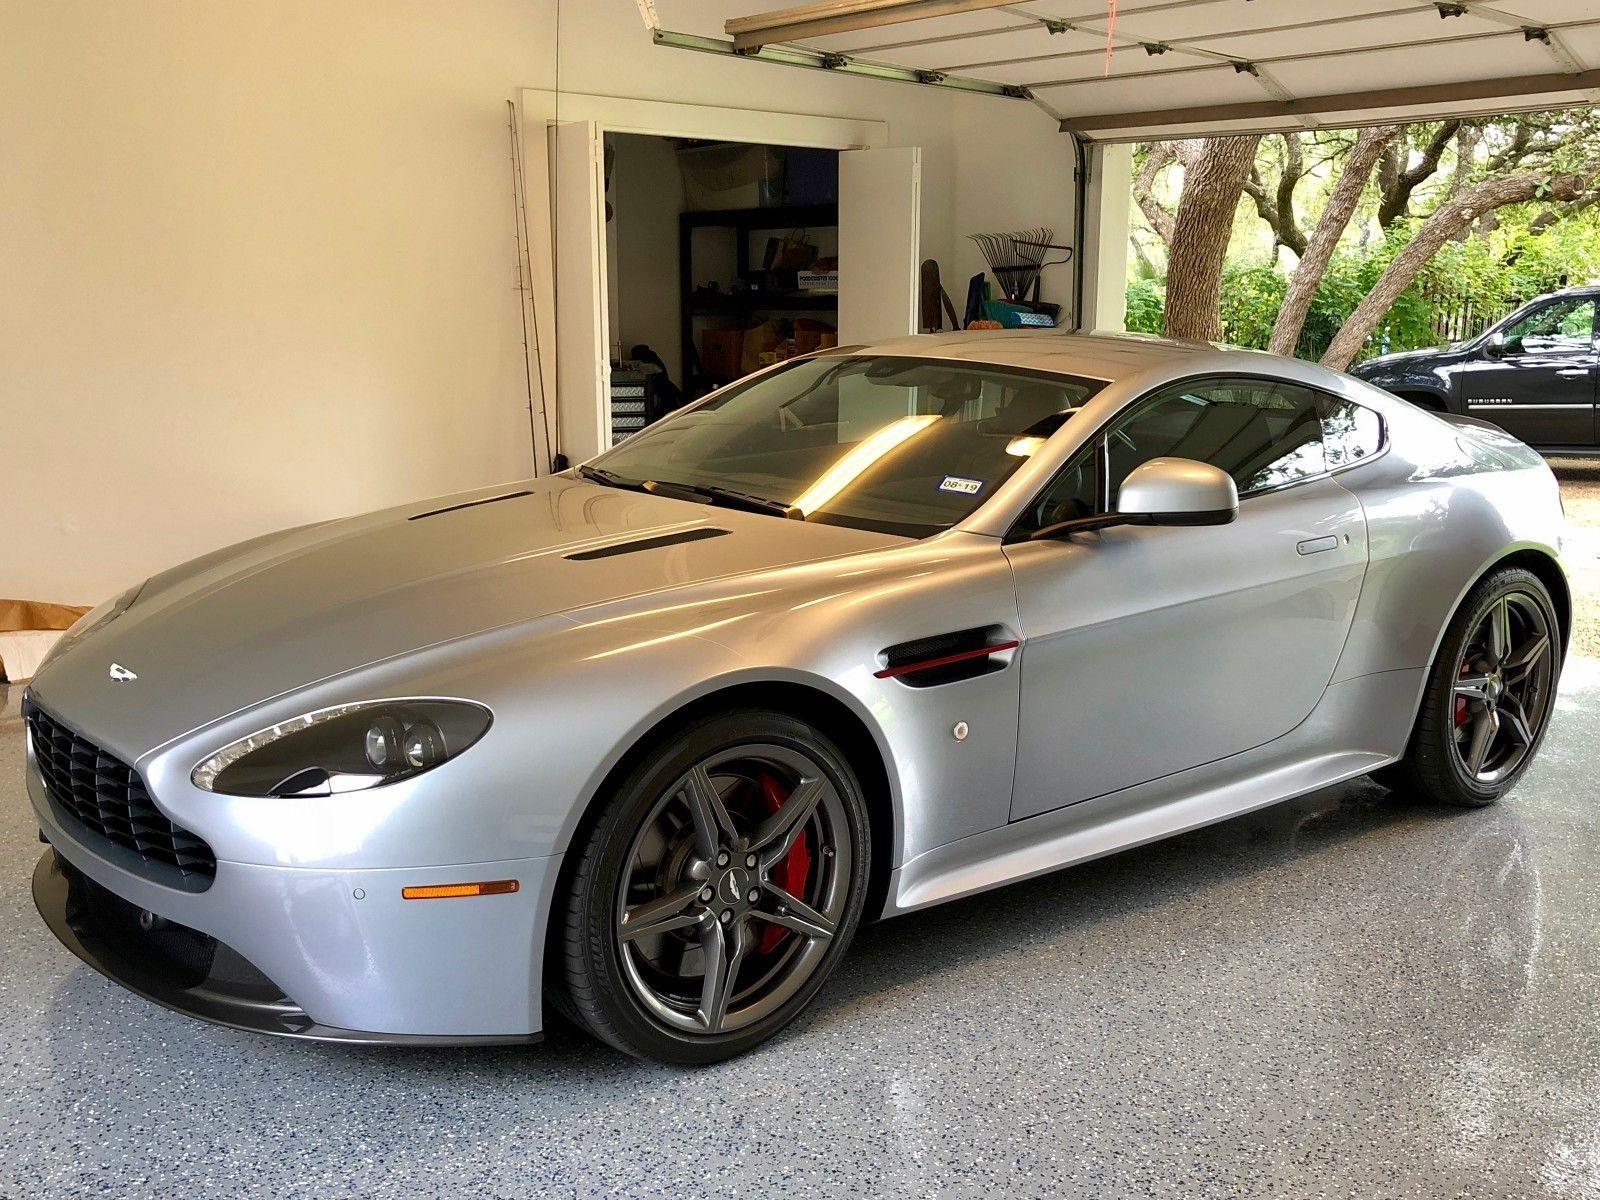 2016 Aston Martin Vantage Gt Aston Martin Aston Martin Vantage Aston